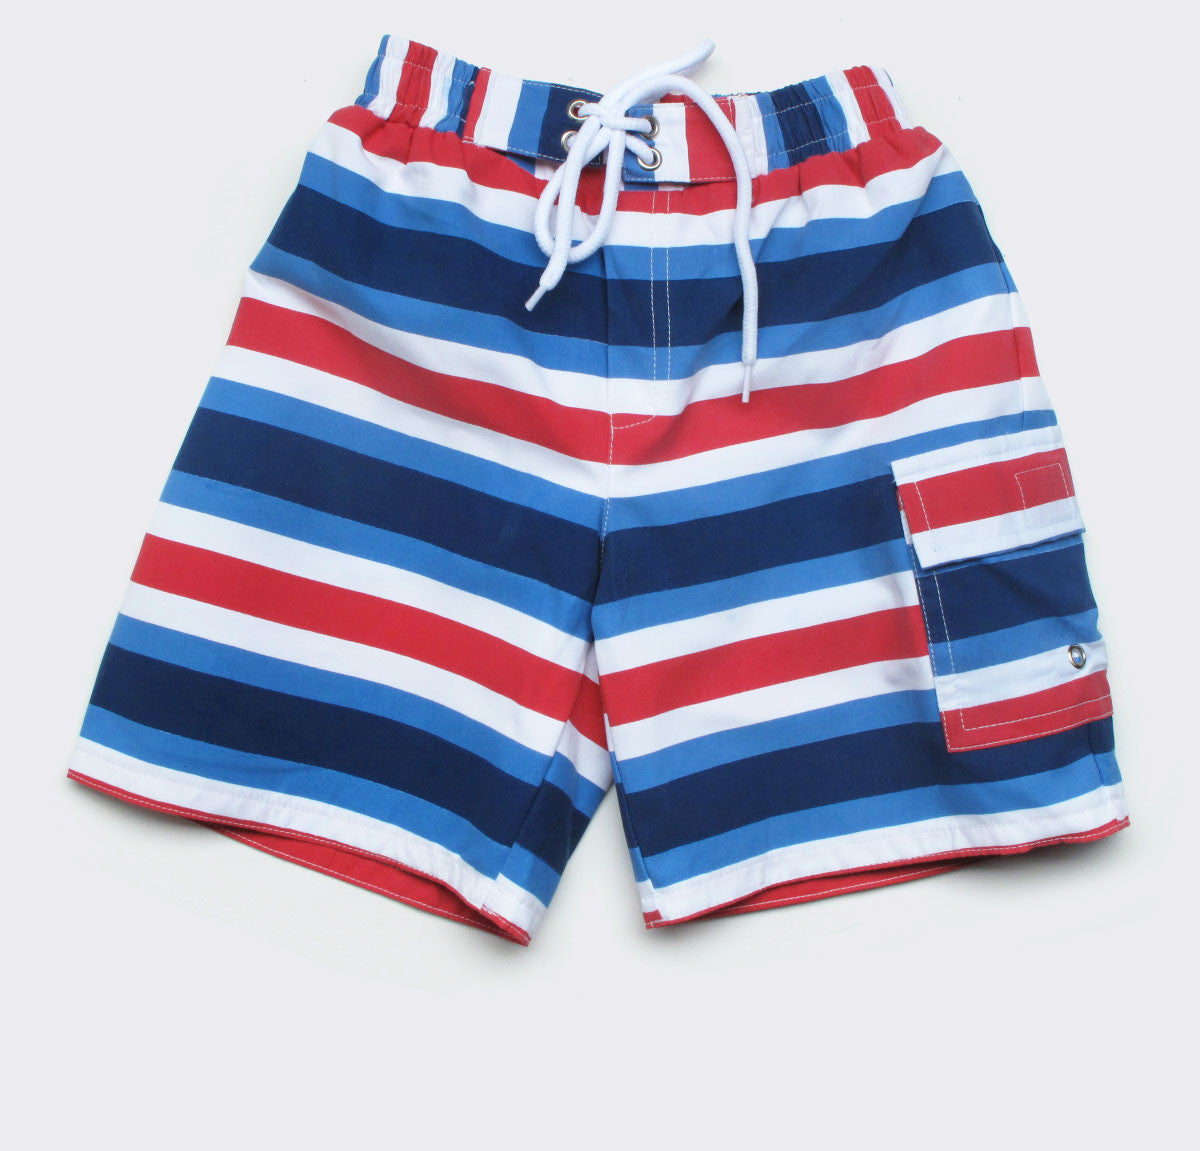 baby swim trunks in ocean/red Contrast Stripe print